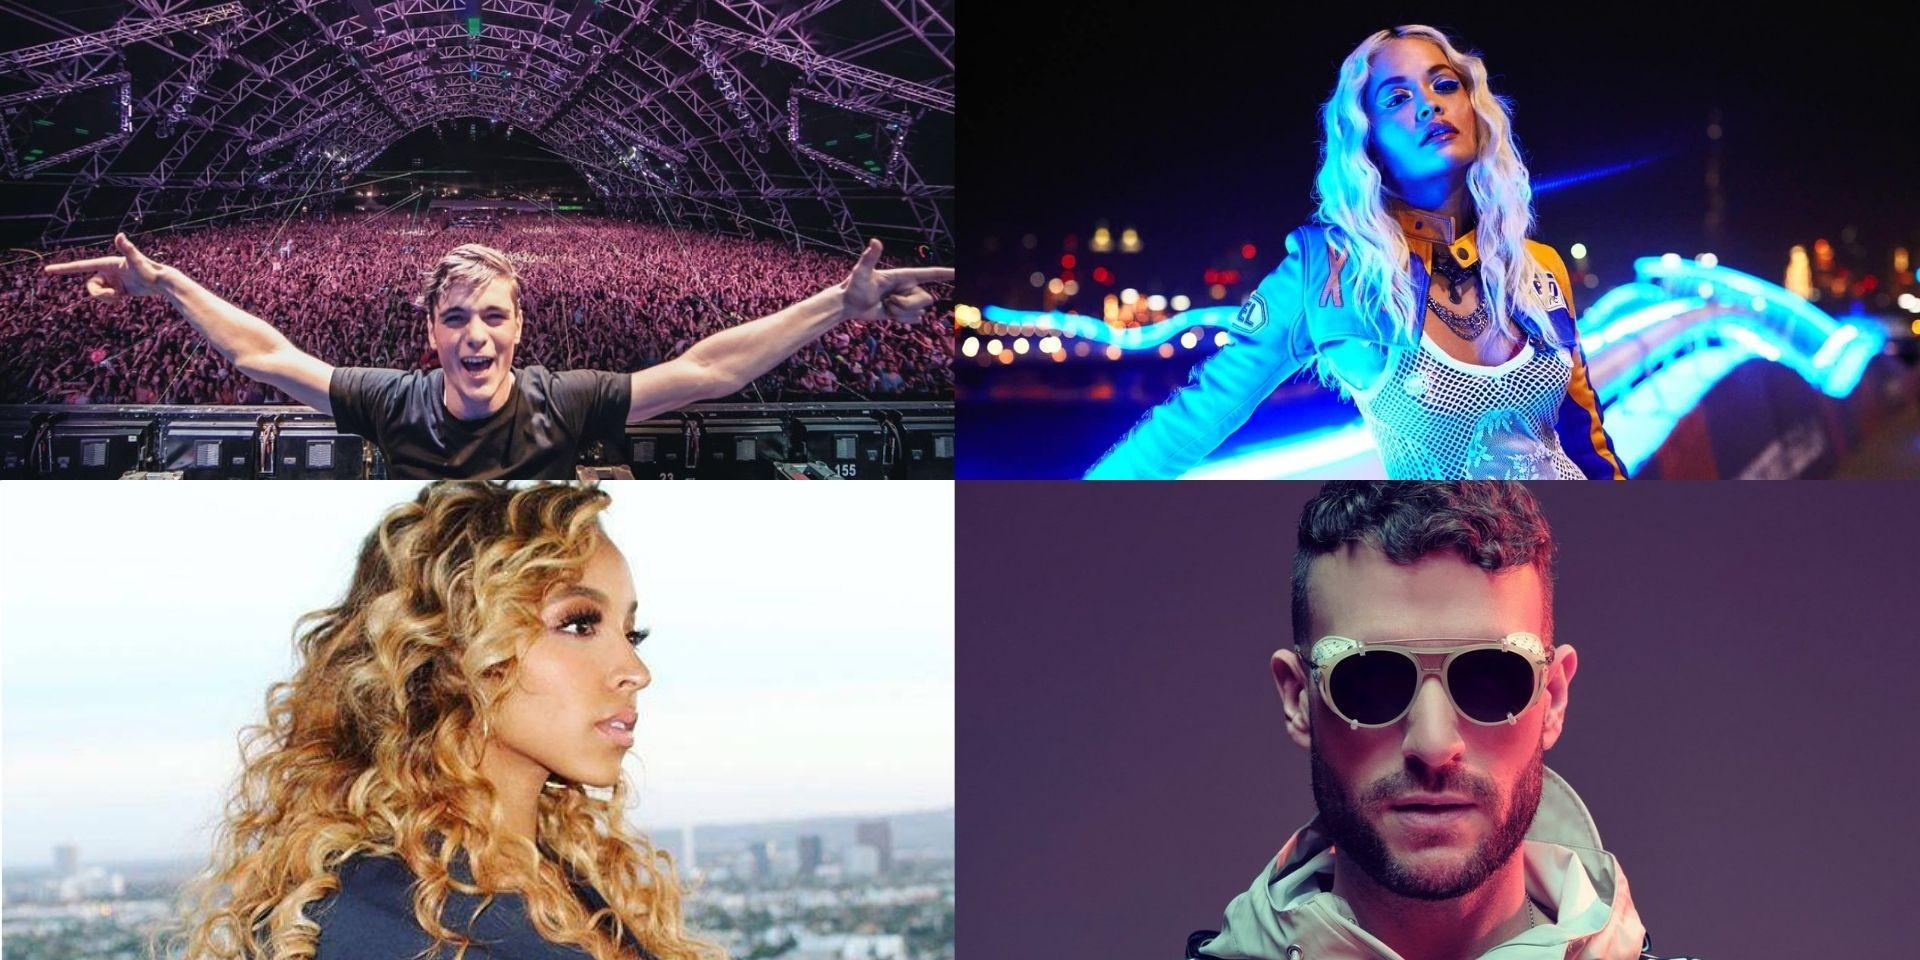 Martin Garrix, Don Diablo, Tinashe, Rita Ora, and more to perform at Hydeout: The Prelude digital music festival